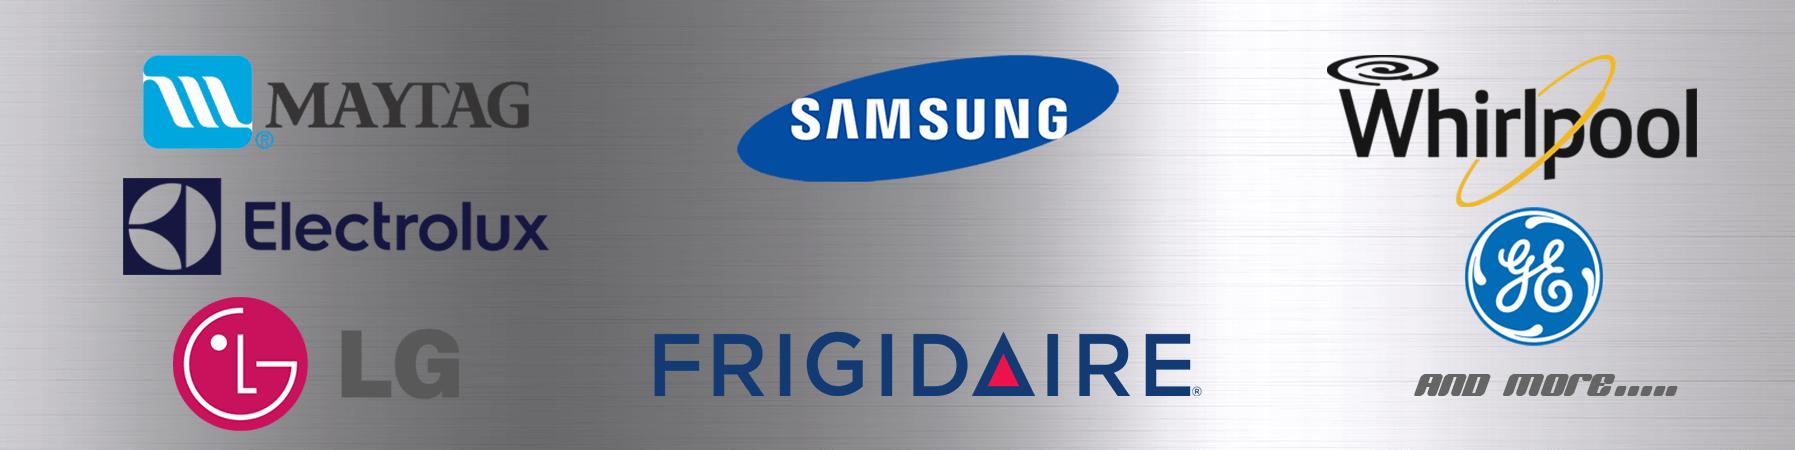 We Repair Most Major Appliance Brands!